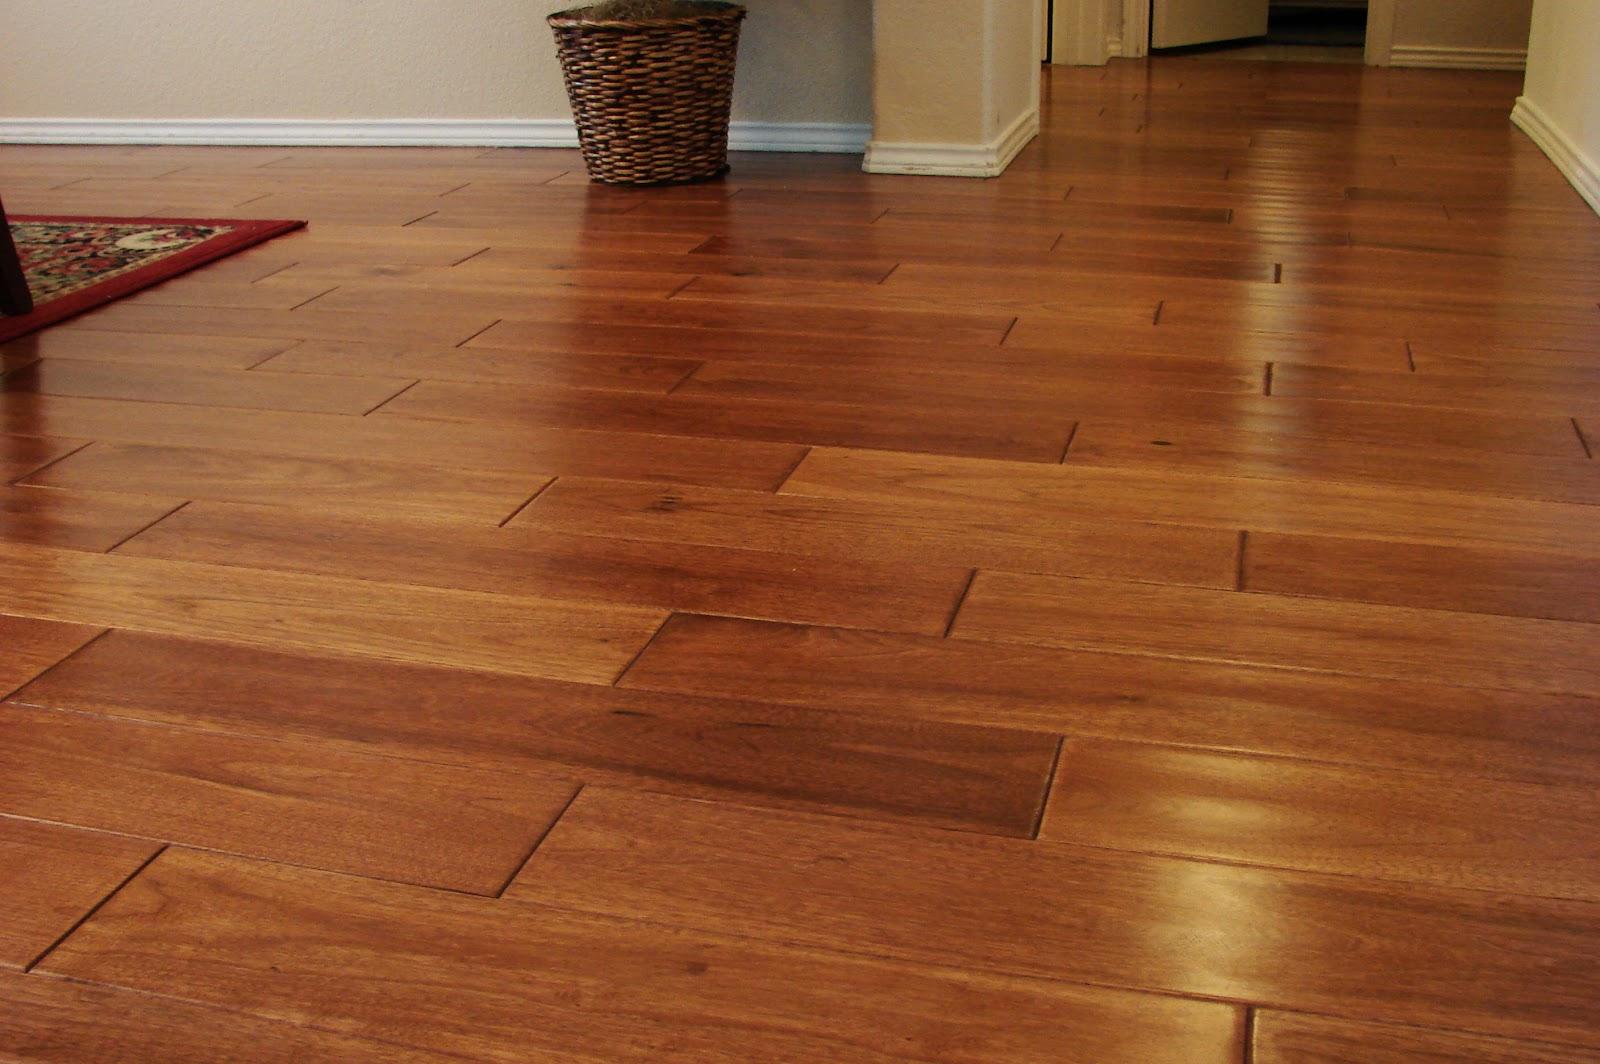 Wood_flooring_made_of_hickory_wood.jpg